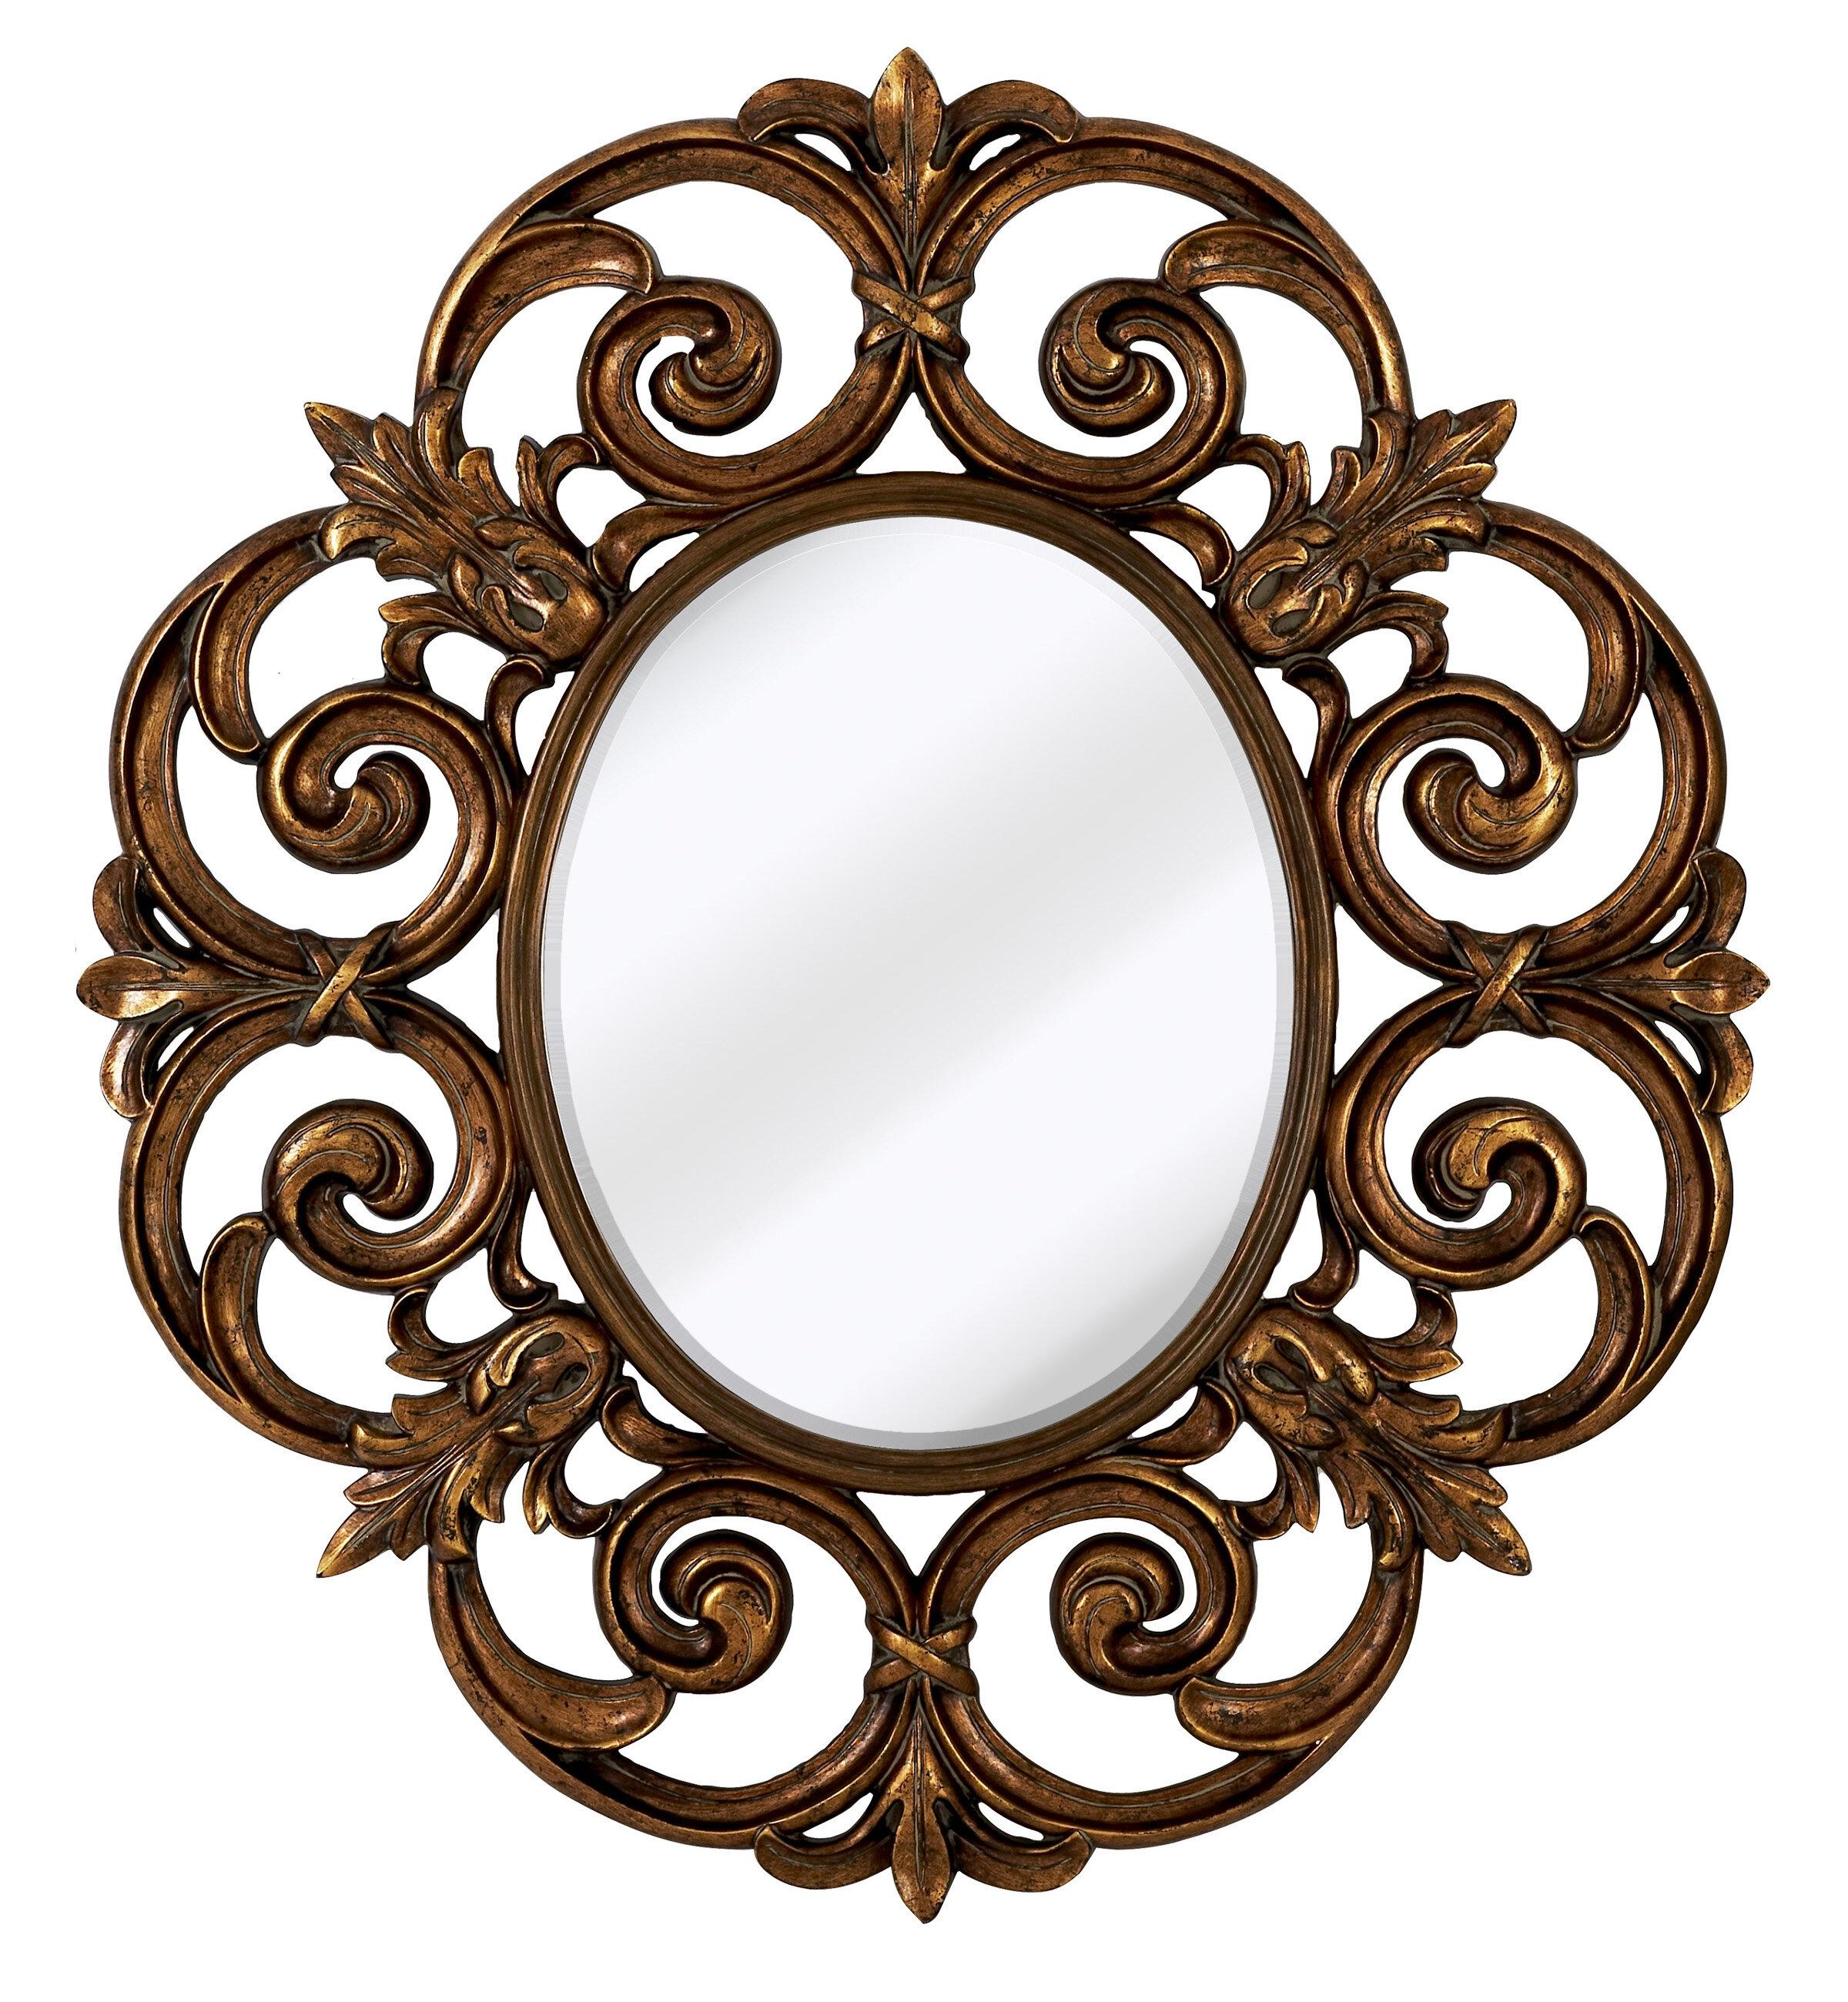 decor kitchen decorative mirror amazon wall abbyson com dp home round zen